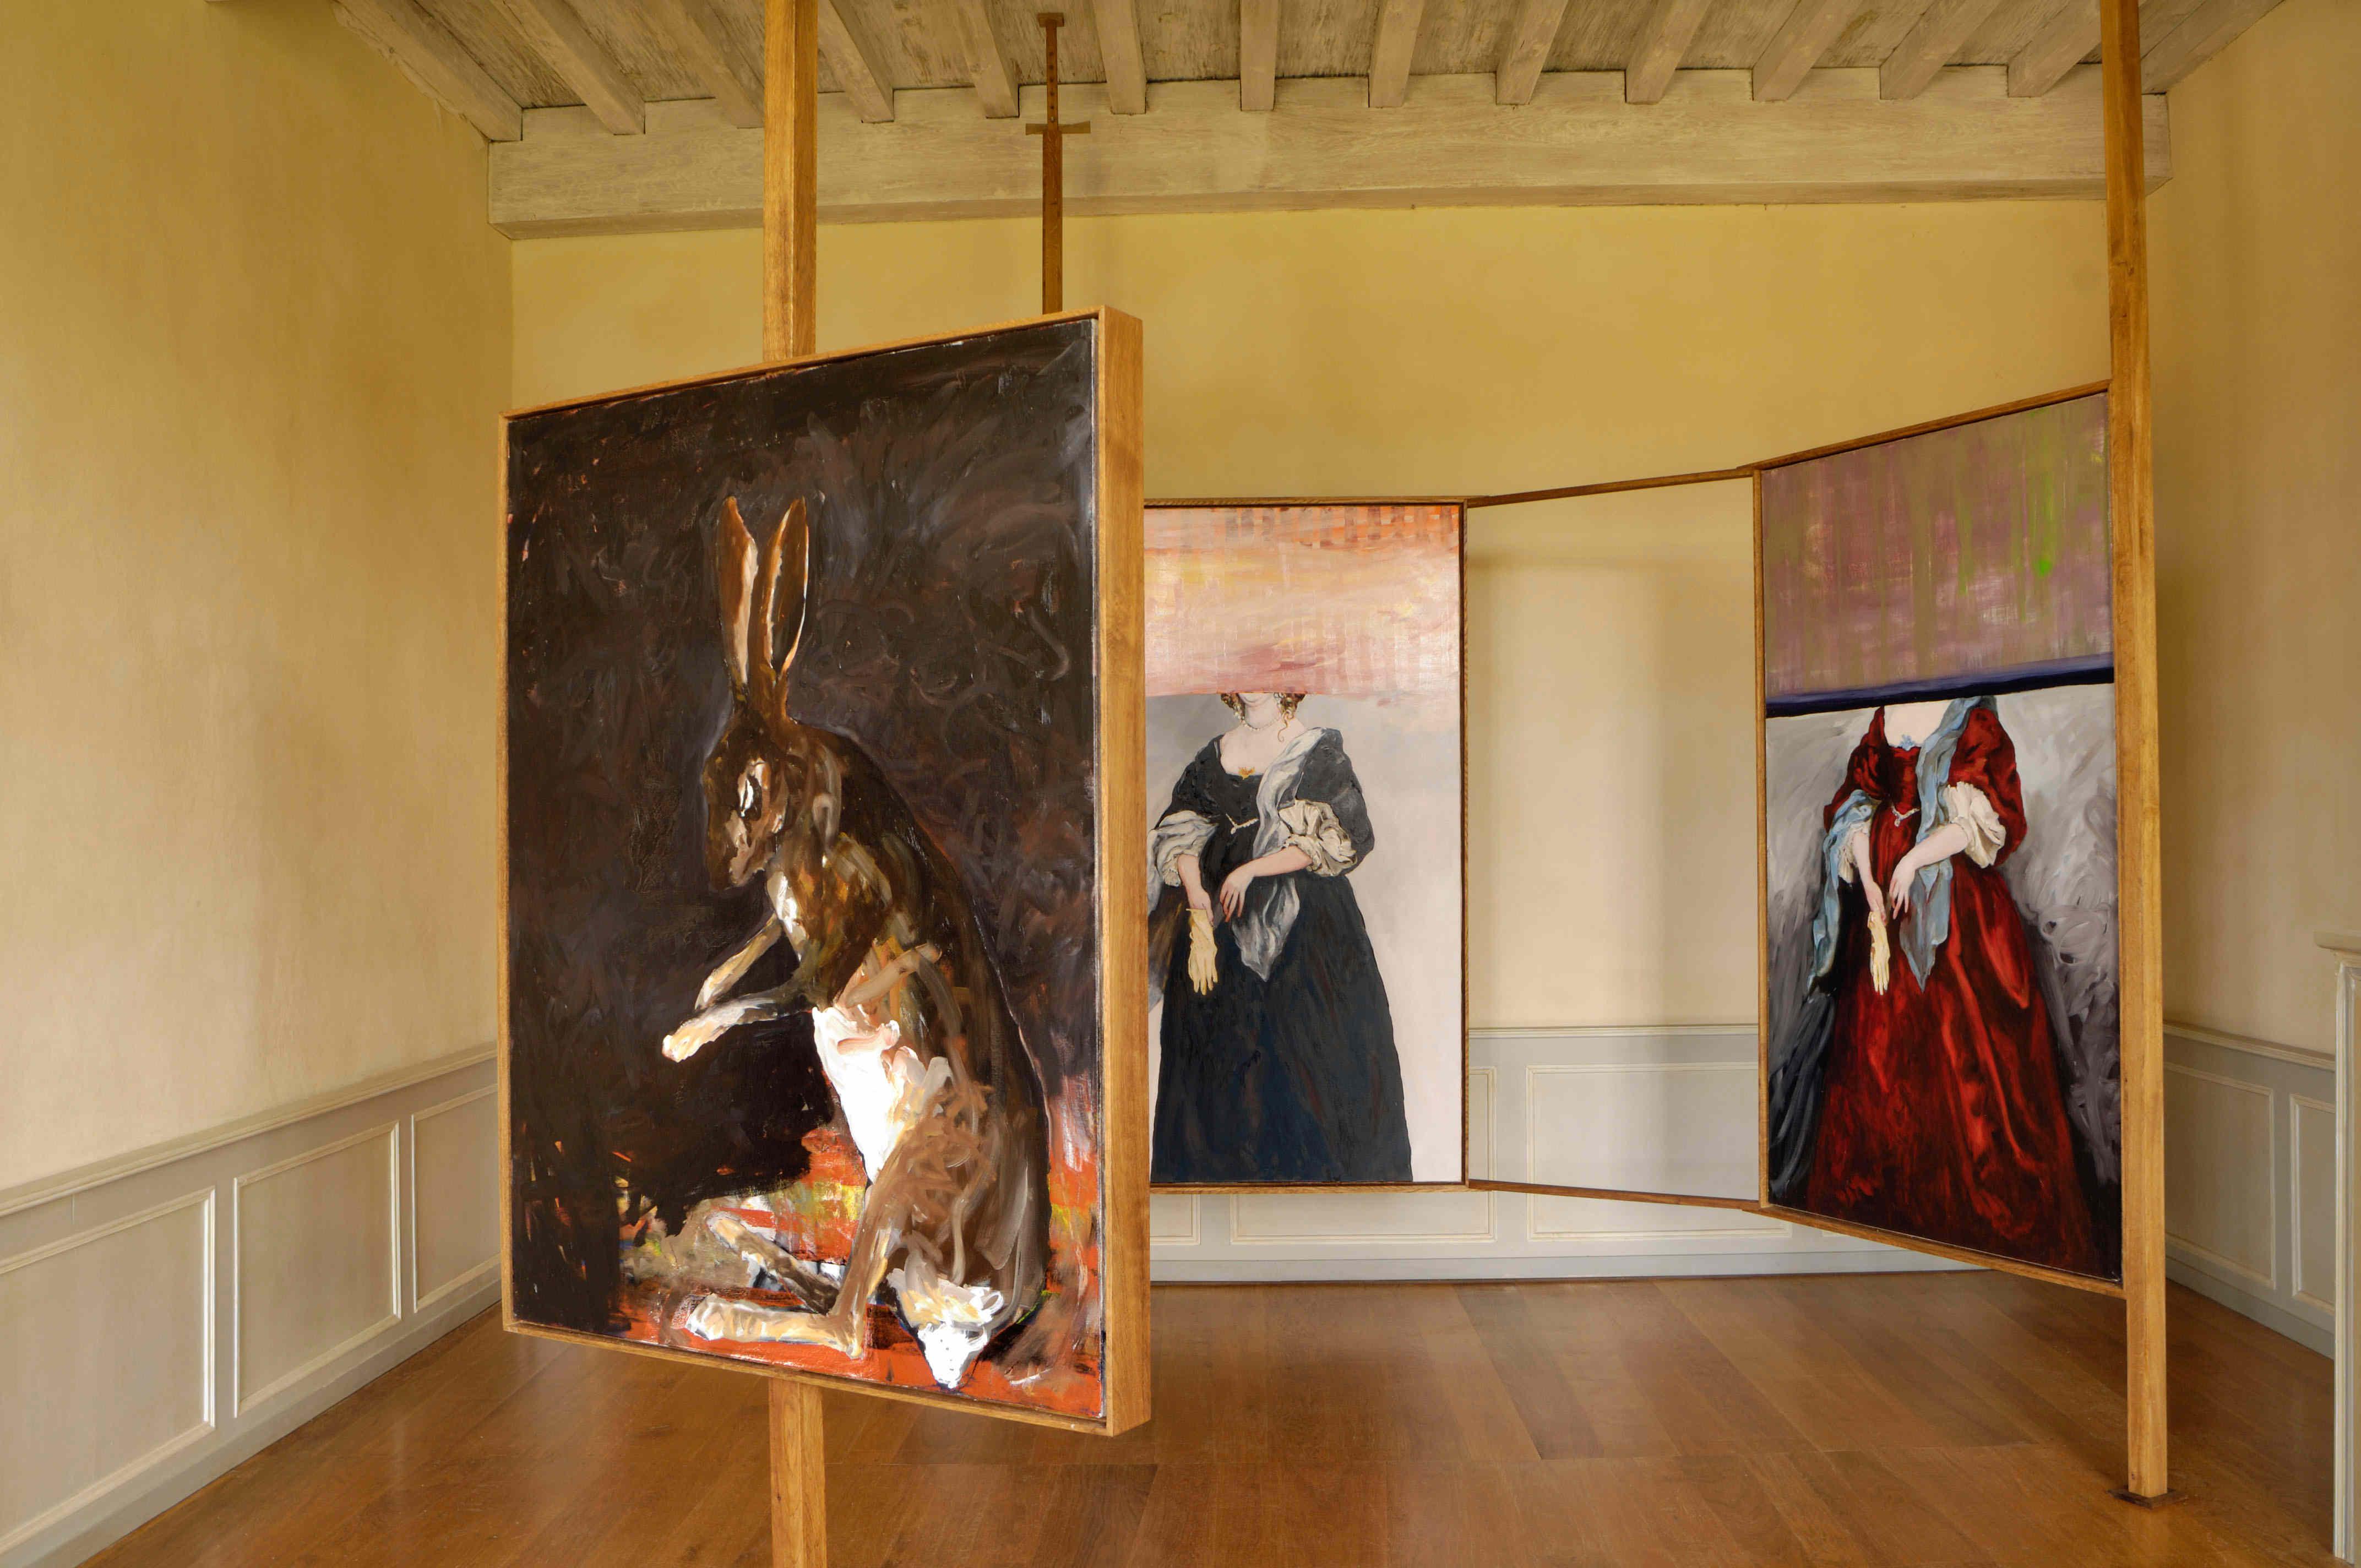 Grand lièvre fond noir (2010), Lady Anne robe noire, Lady Anne robe rouge (2005), château de Kerjean